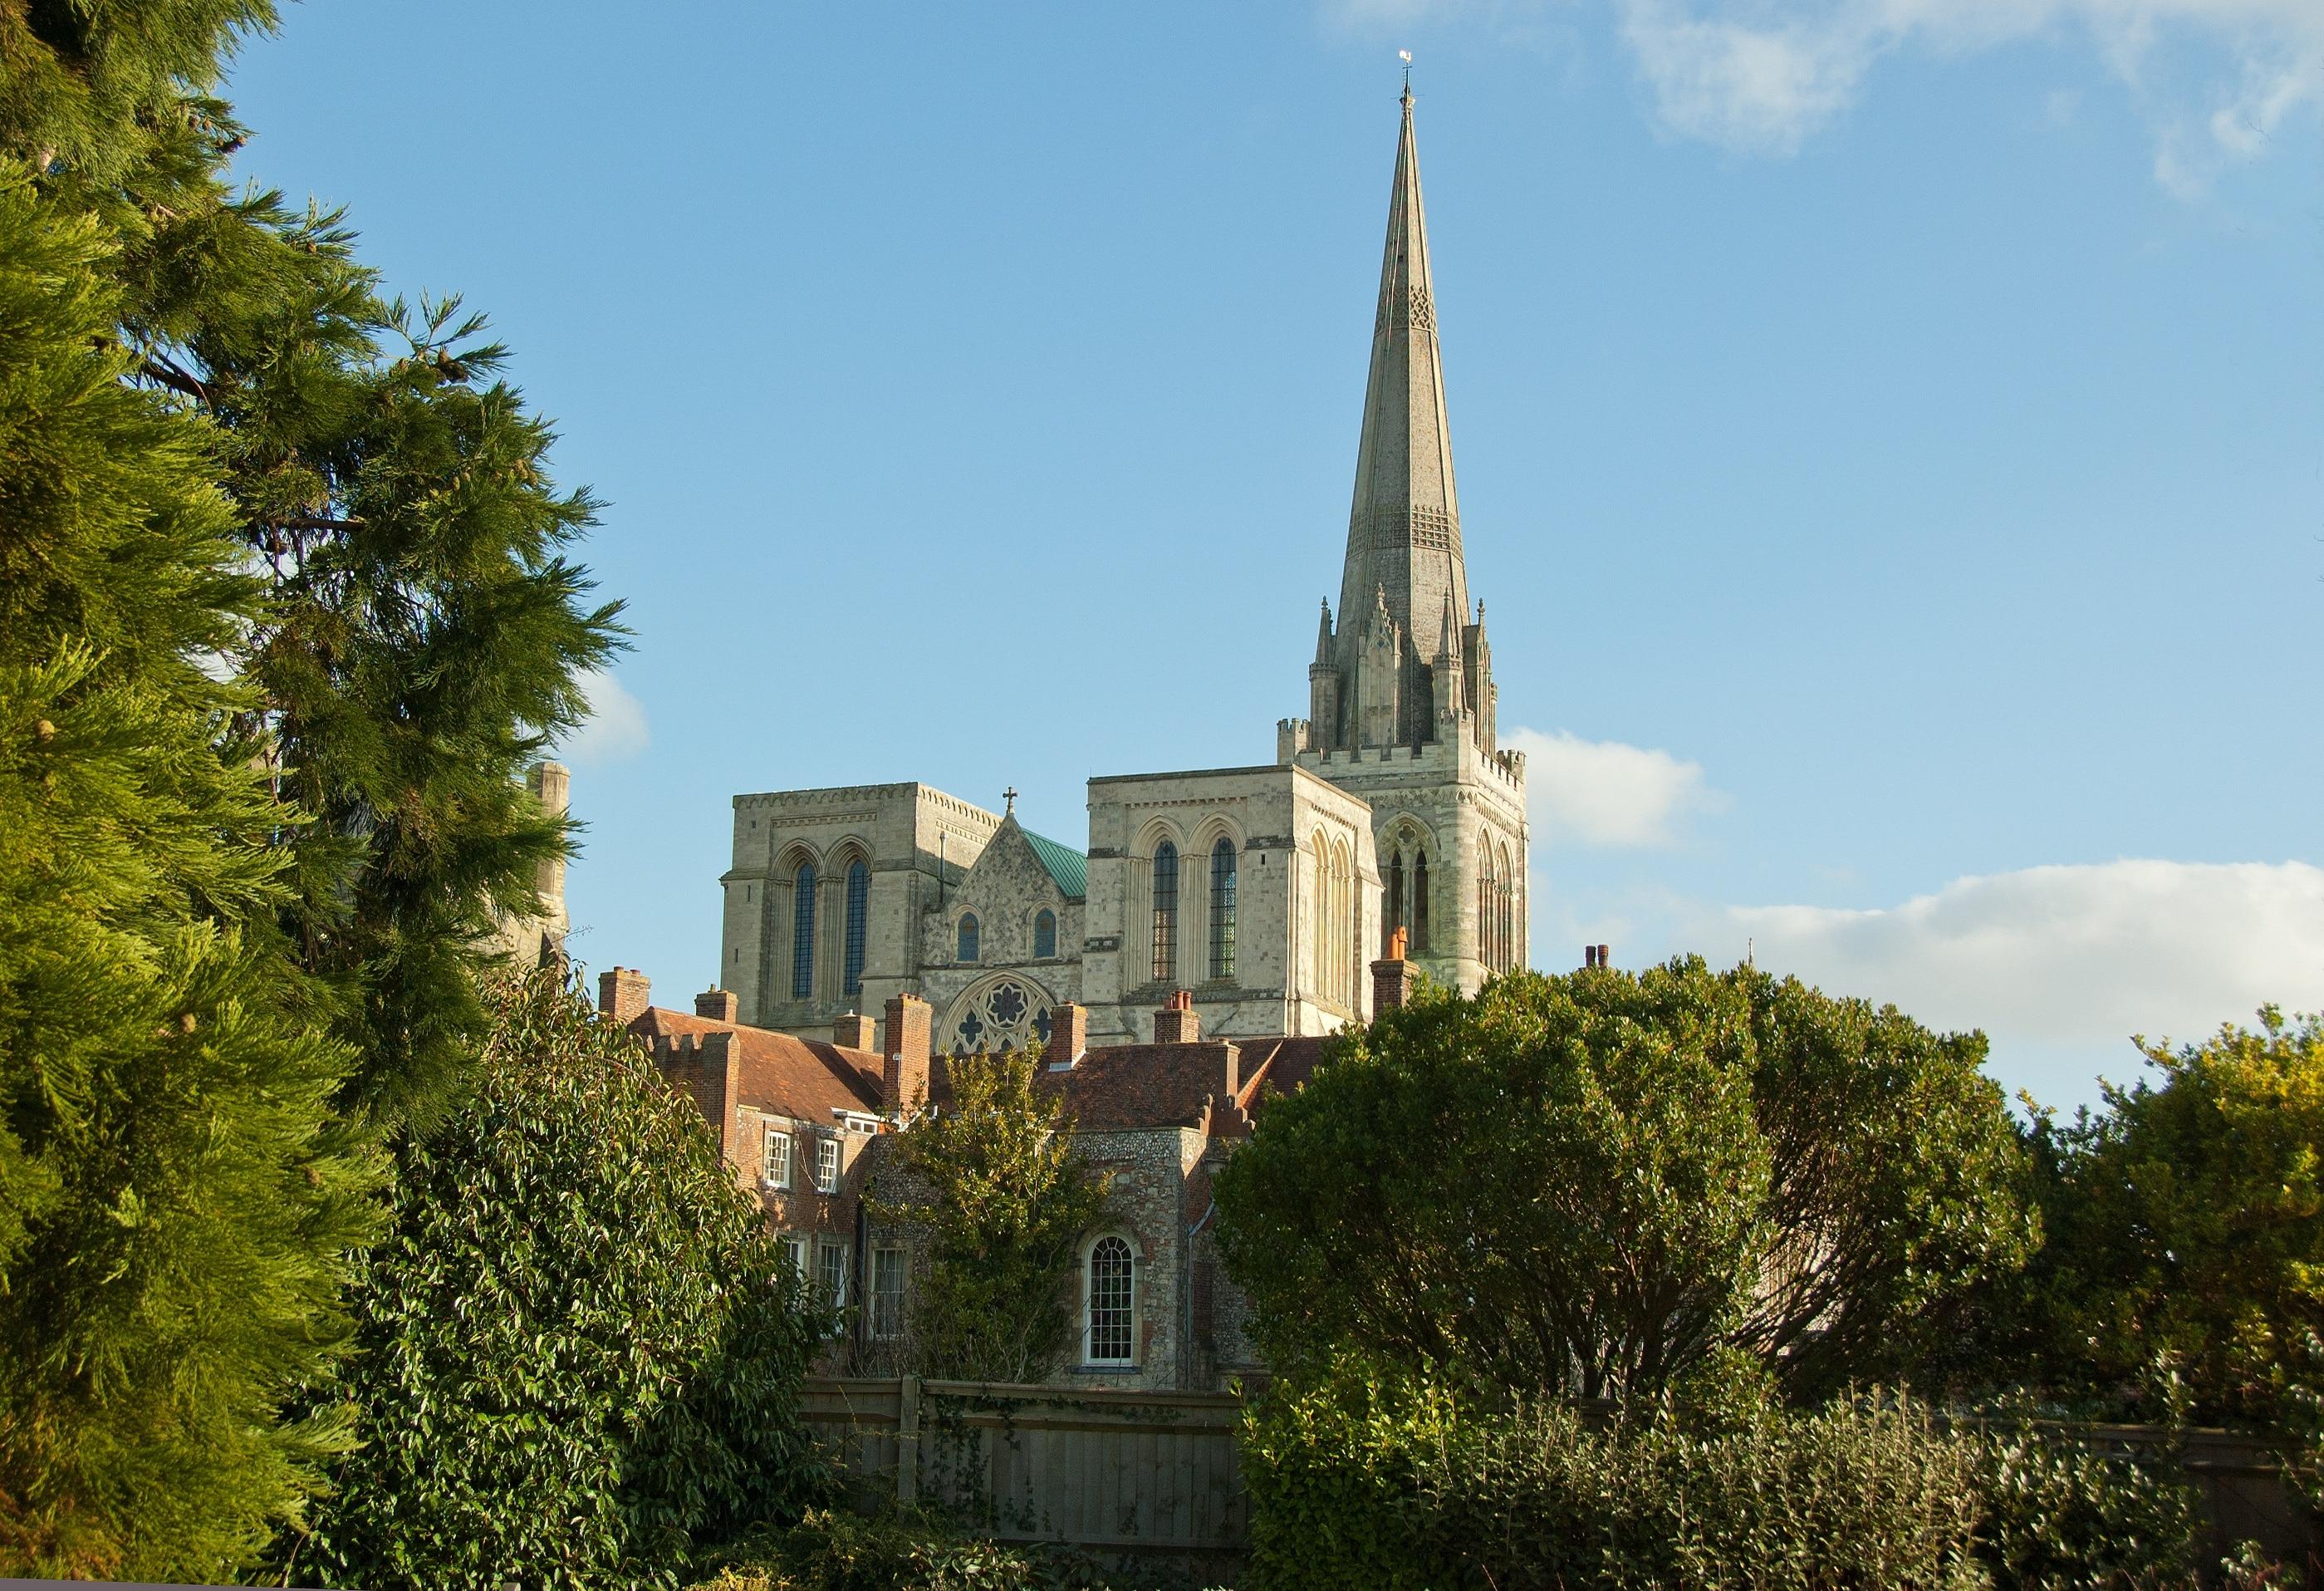 Chichester, England, United Kingdom